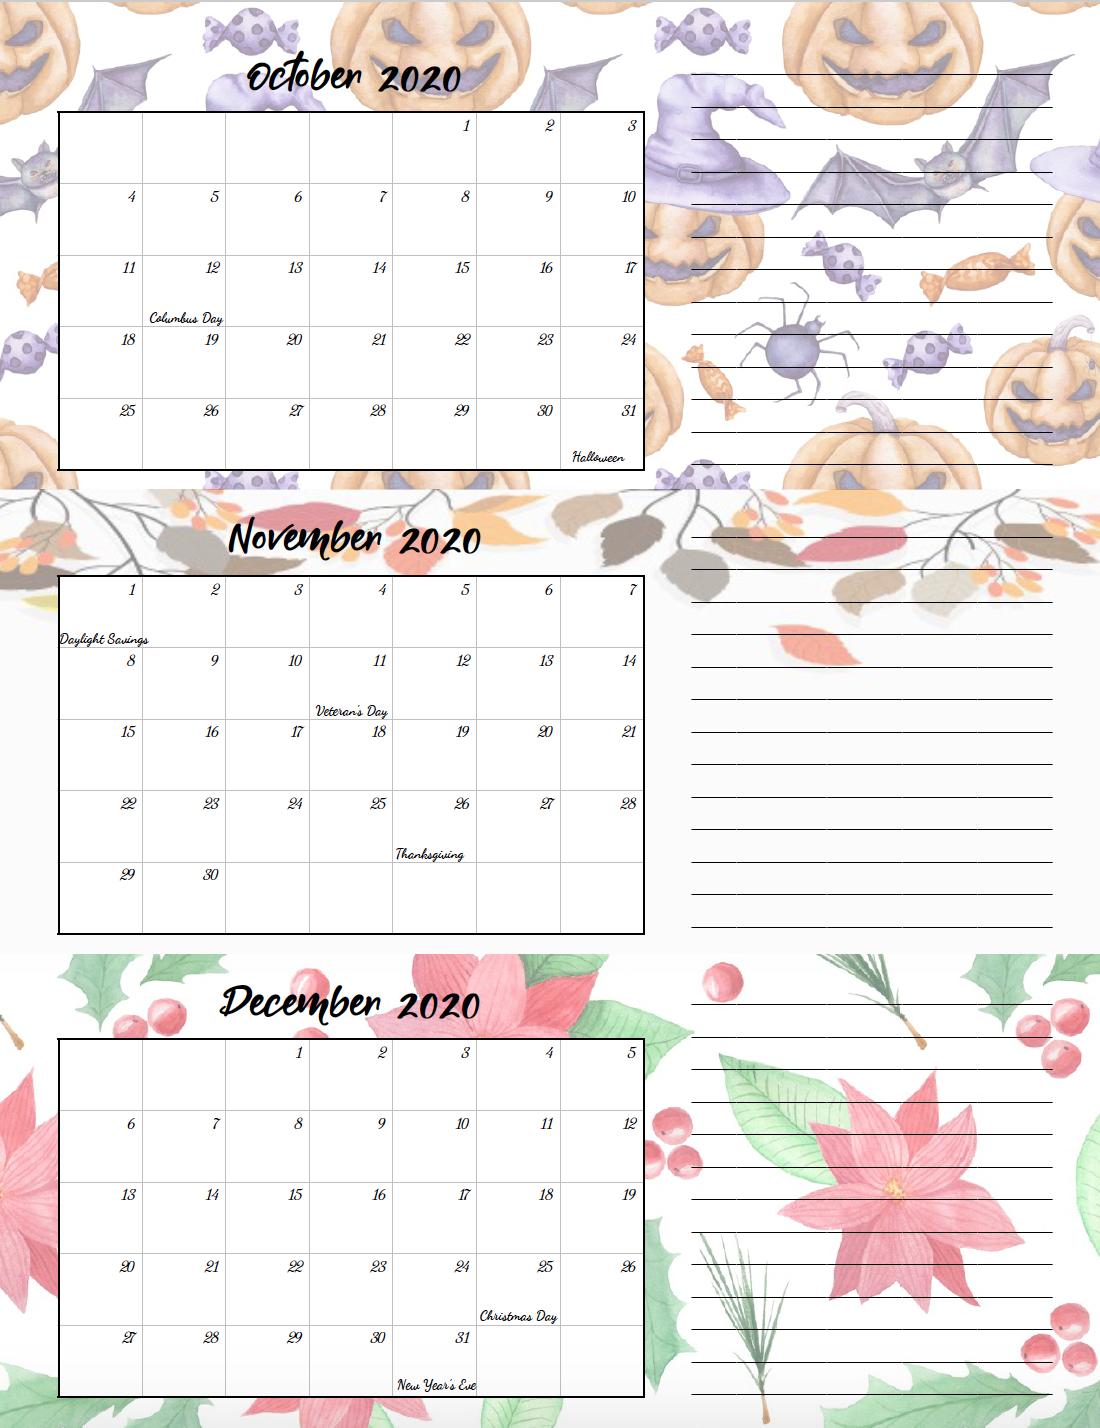 Free Printable 2020 Quarterly Calendars With Holidays: 3